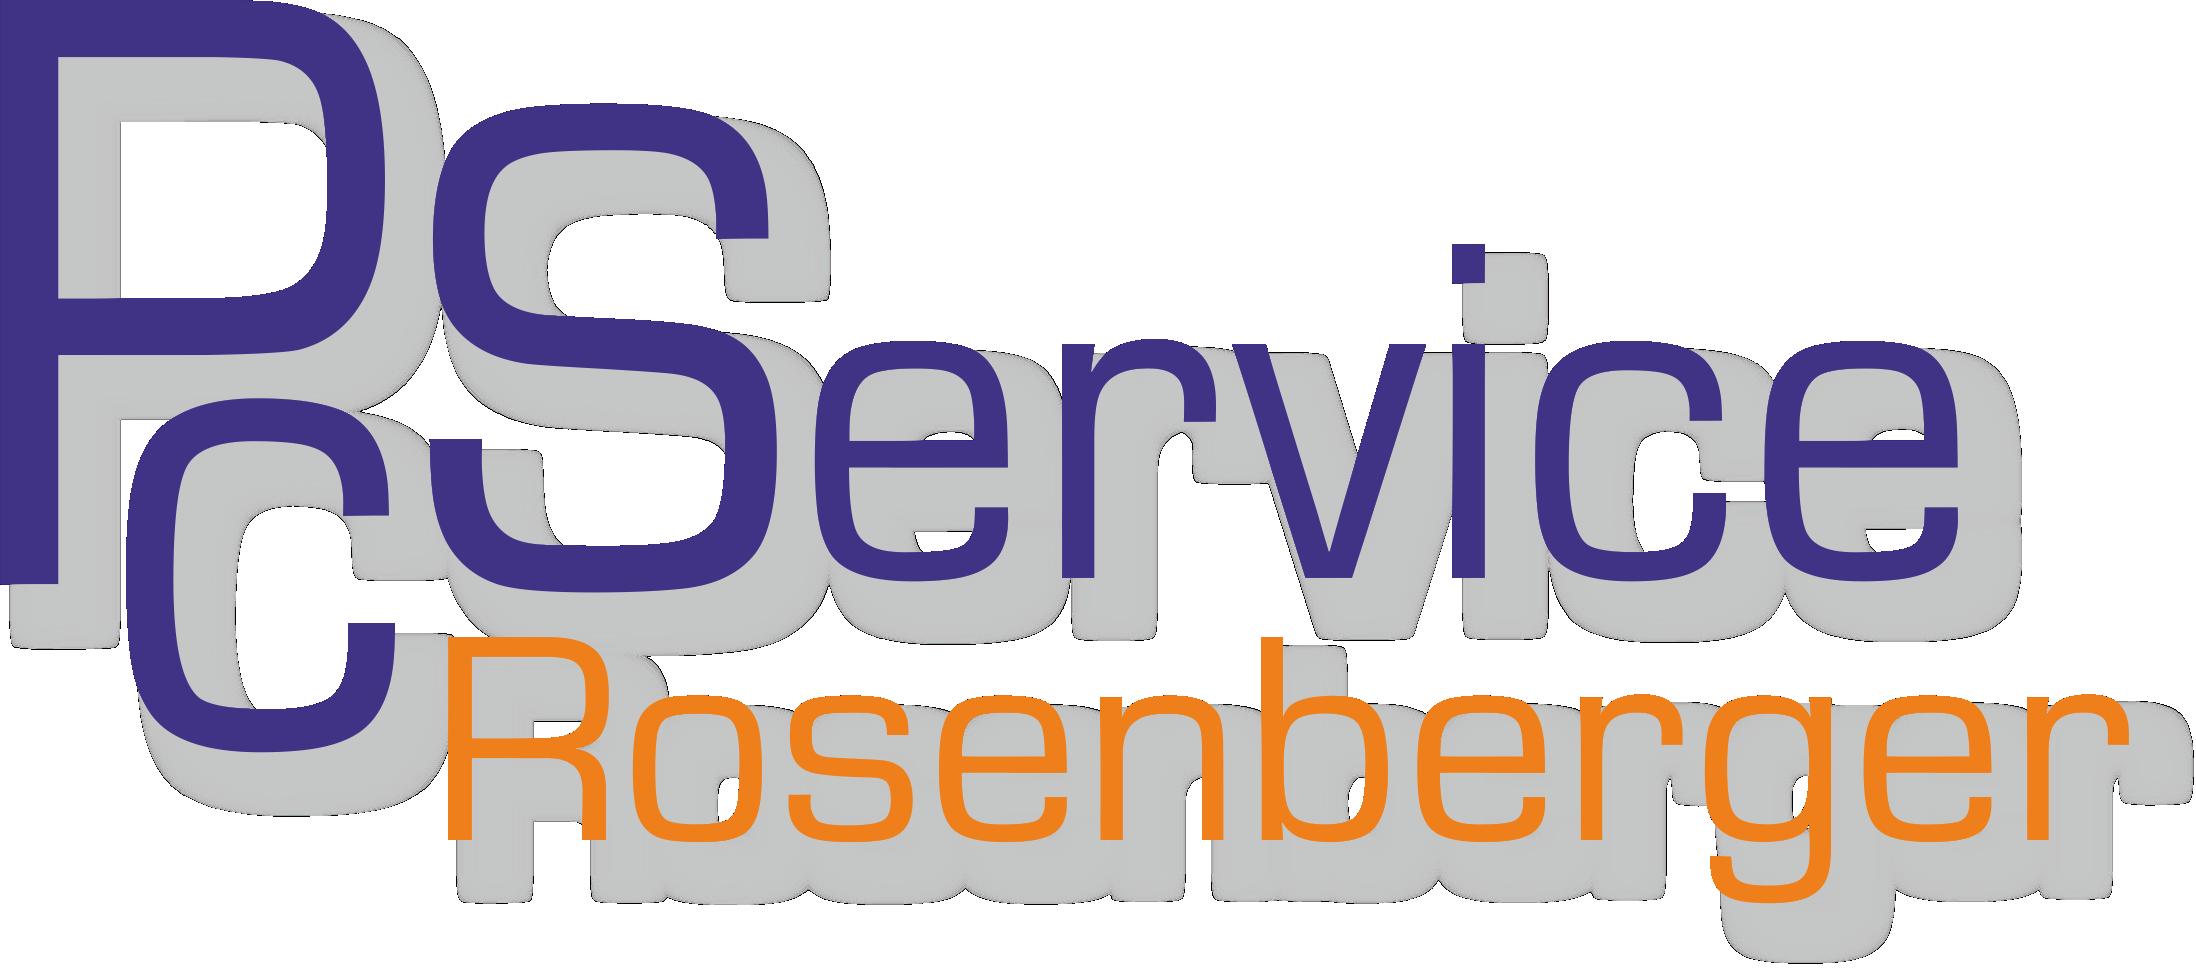 PC Service Rosenberger